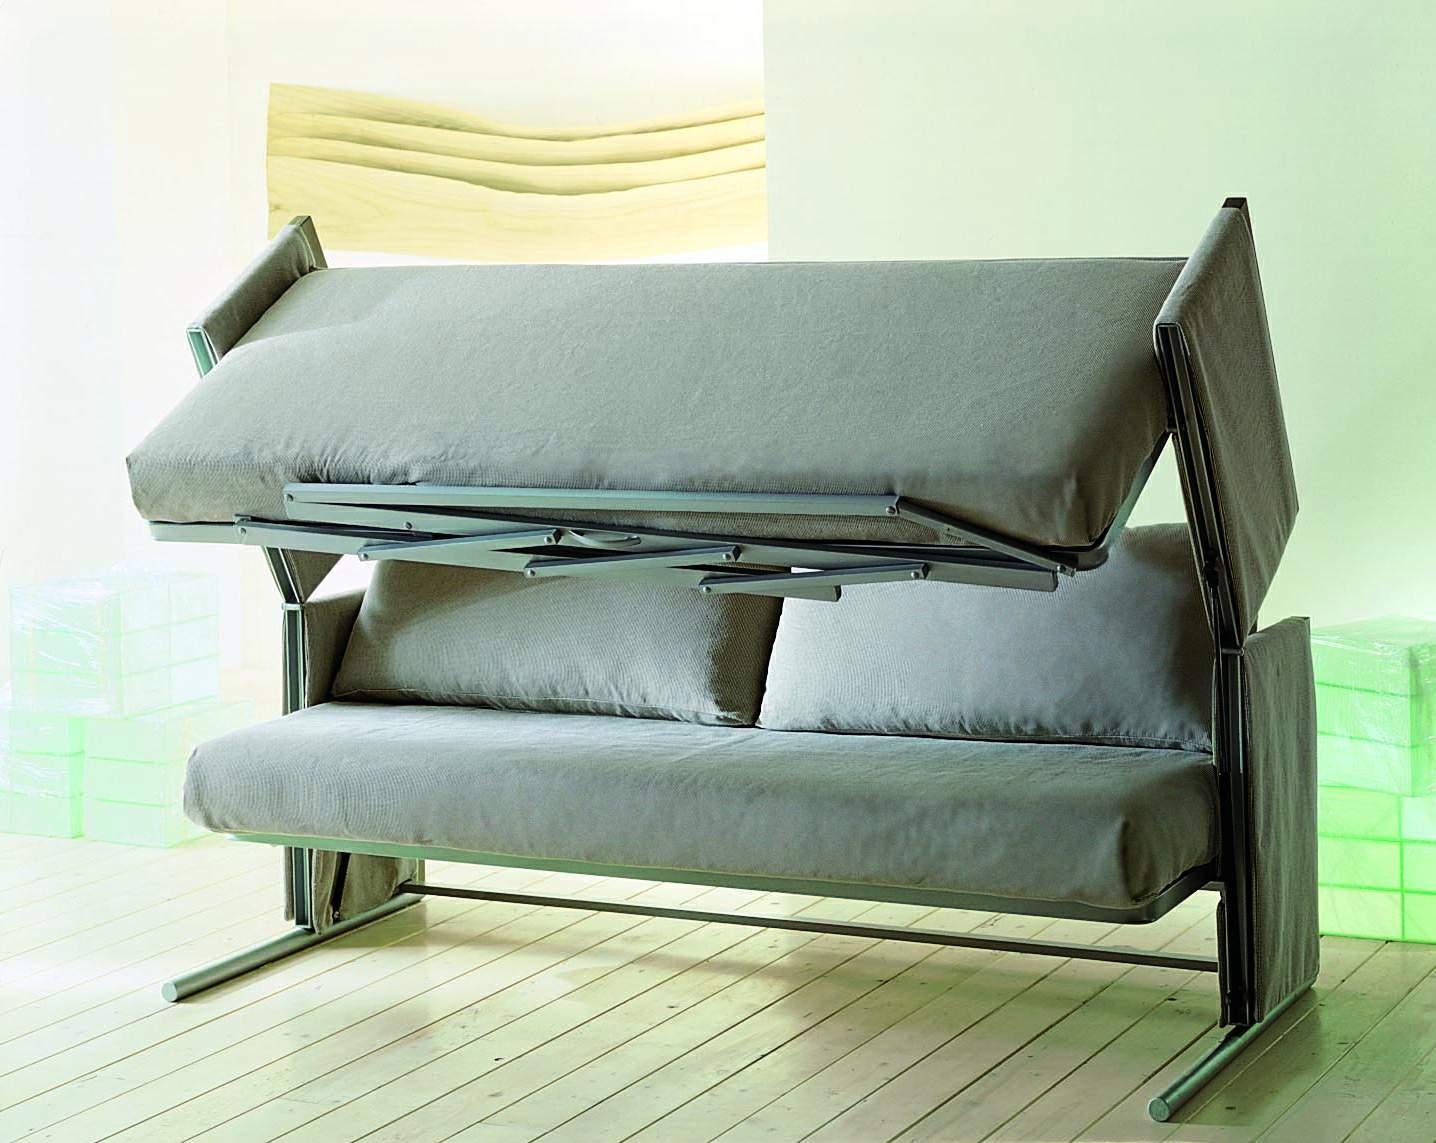 Процесс трансформации дивана